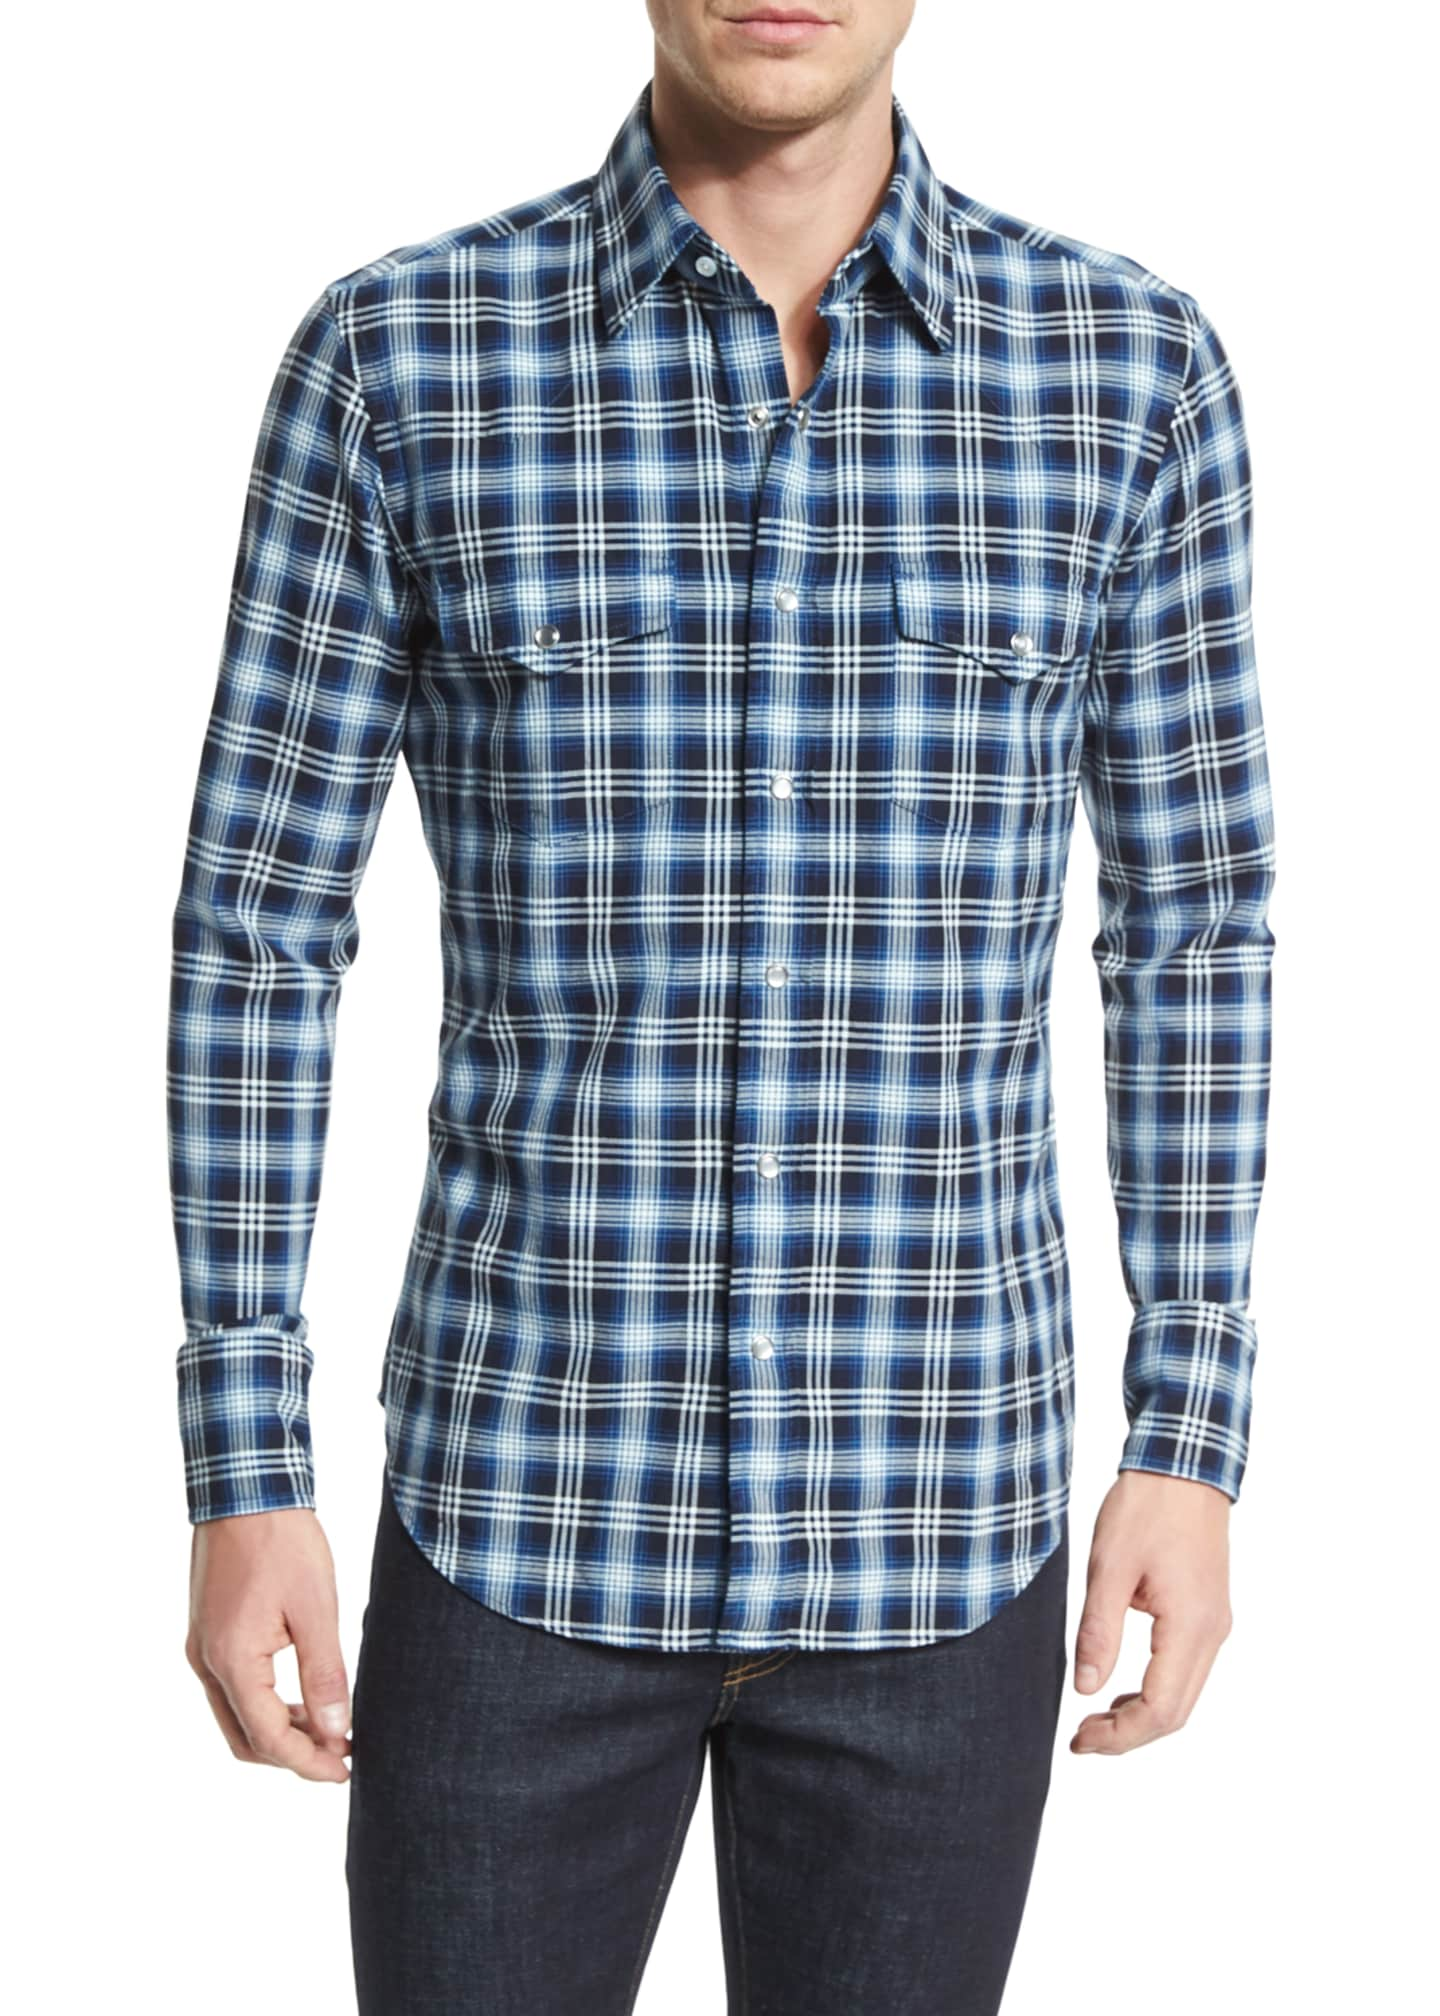 TOM FORD Western-Style Bicolor Check Sport Shirt, Indigo